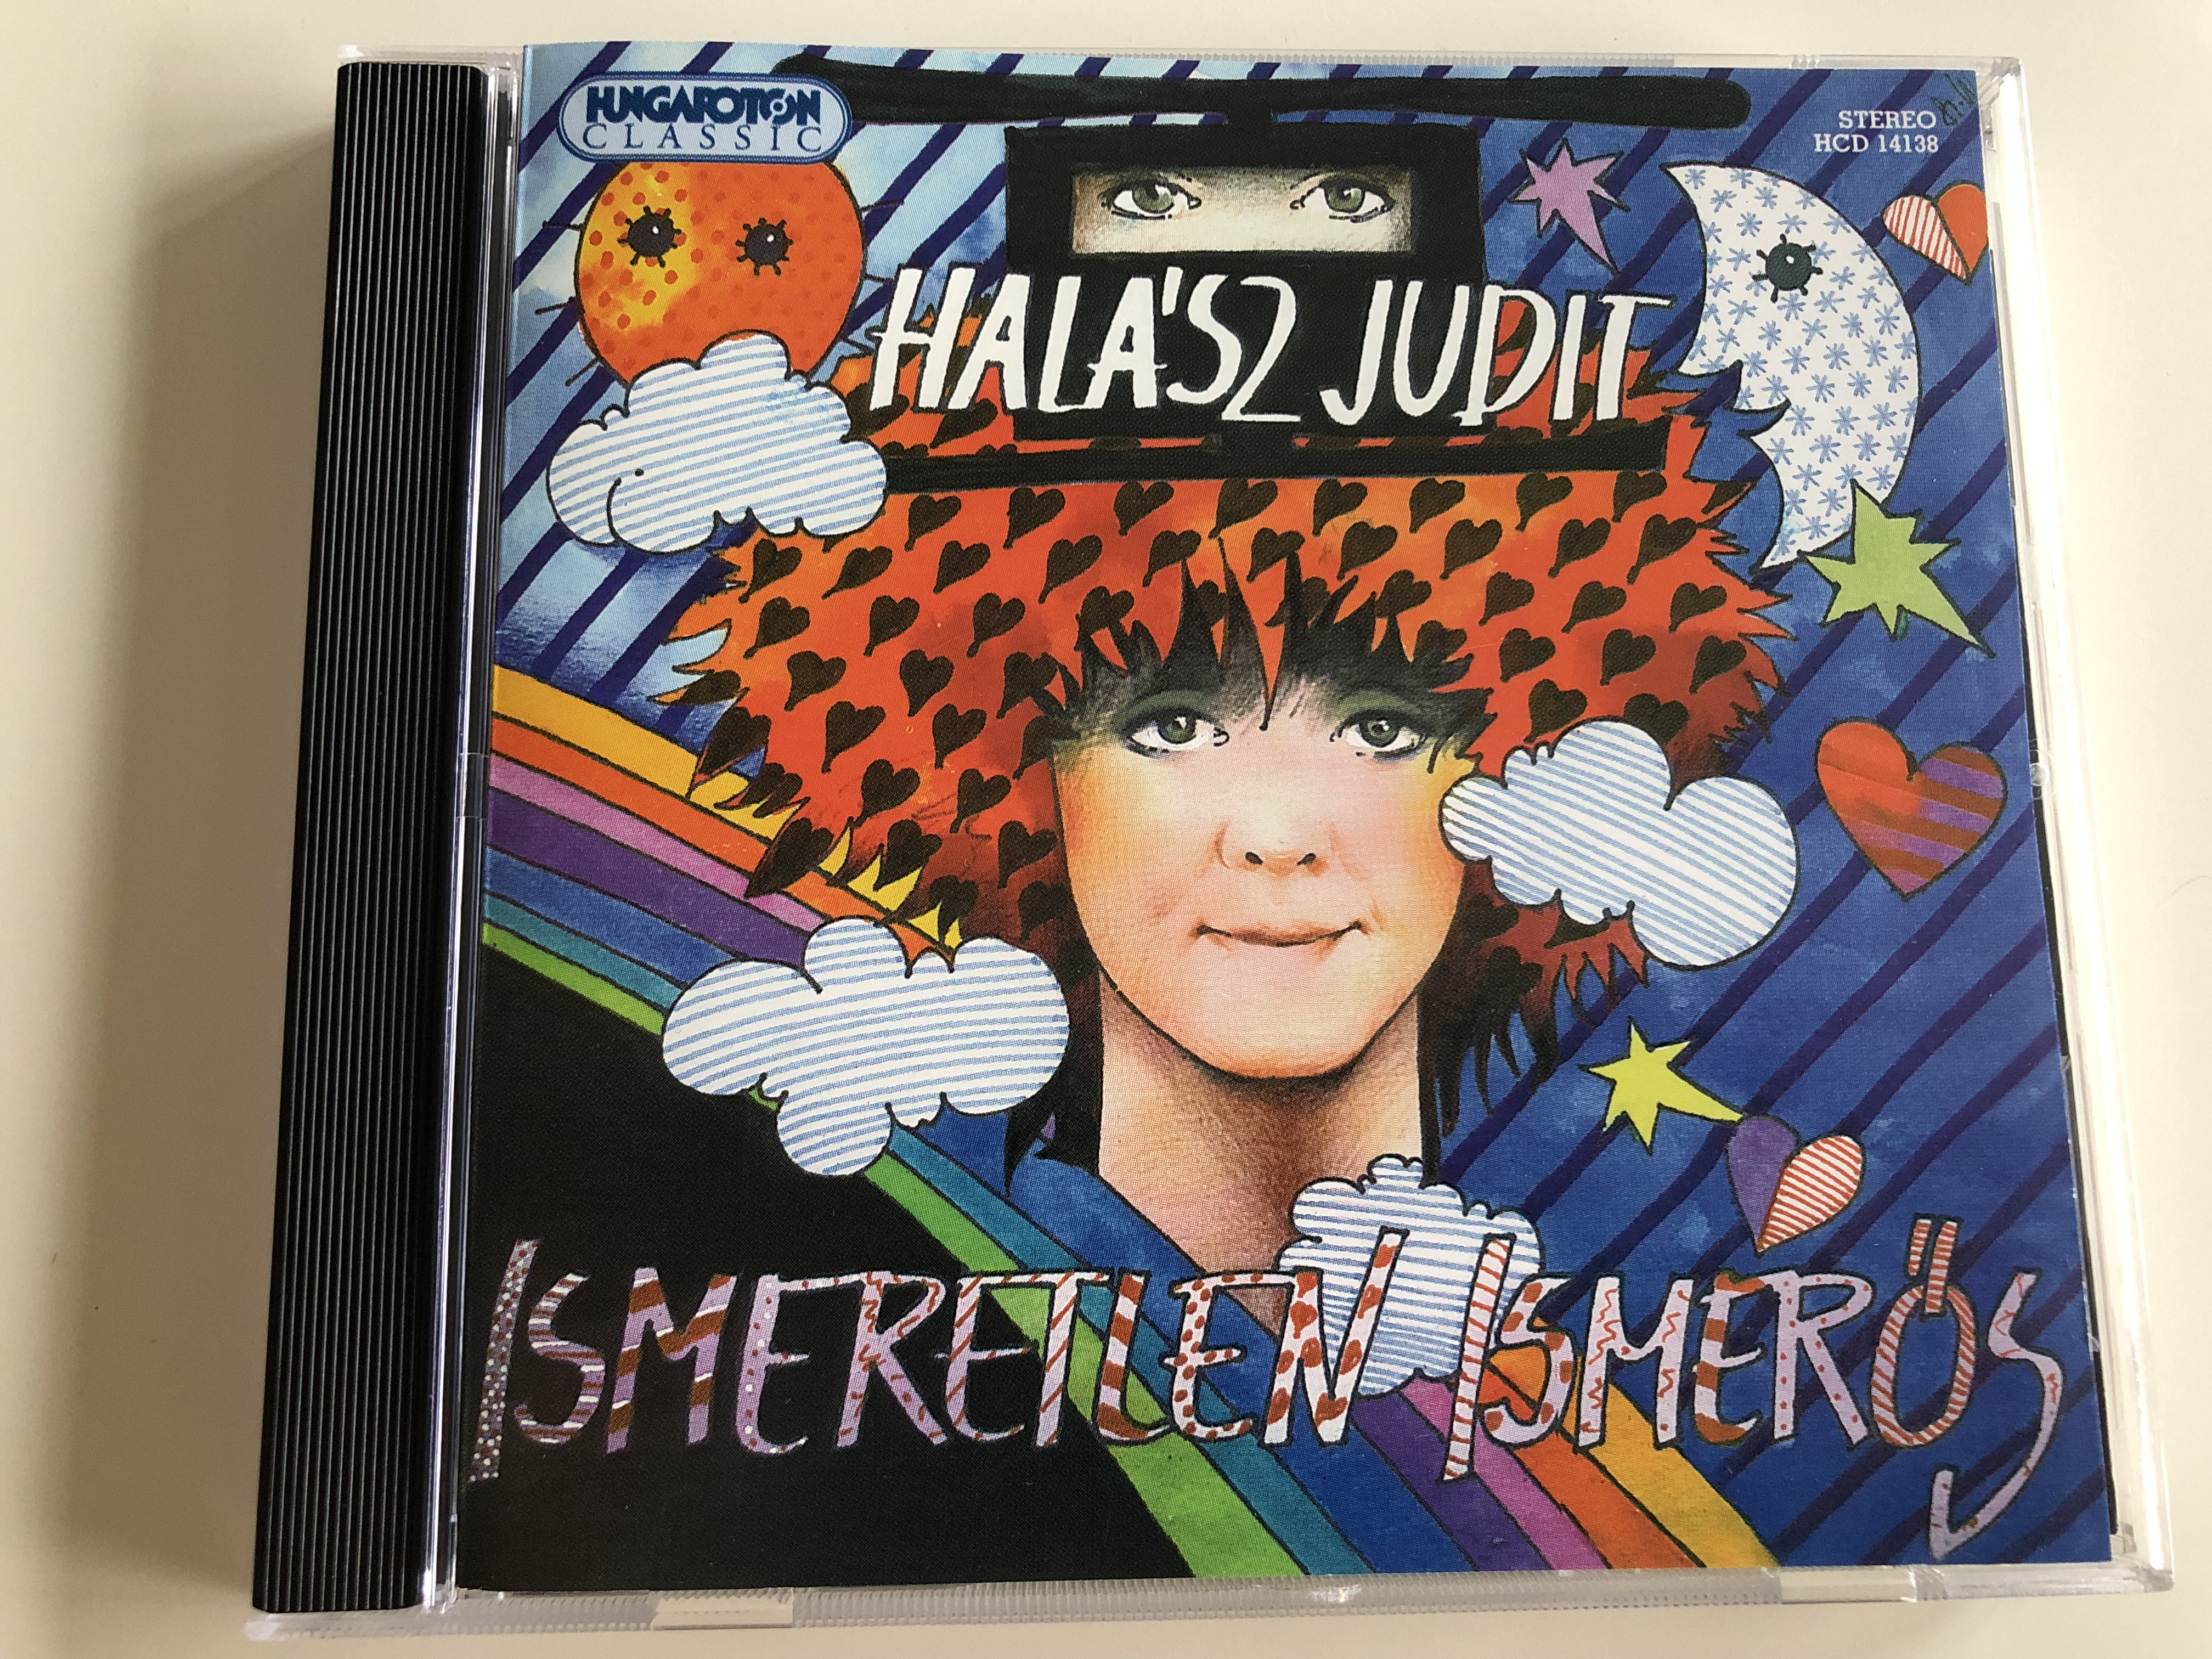 hal-sz-judit-ismeretlen-ismer-s-fonogr-f-audio-cd-2001-hungarian-songs-for-children-hungaroton-classic-hcd-14138-5991811413828-.jpg